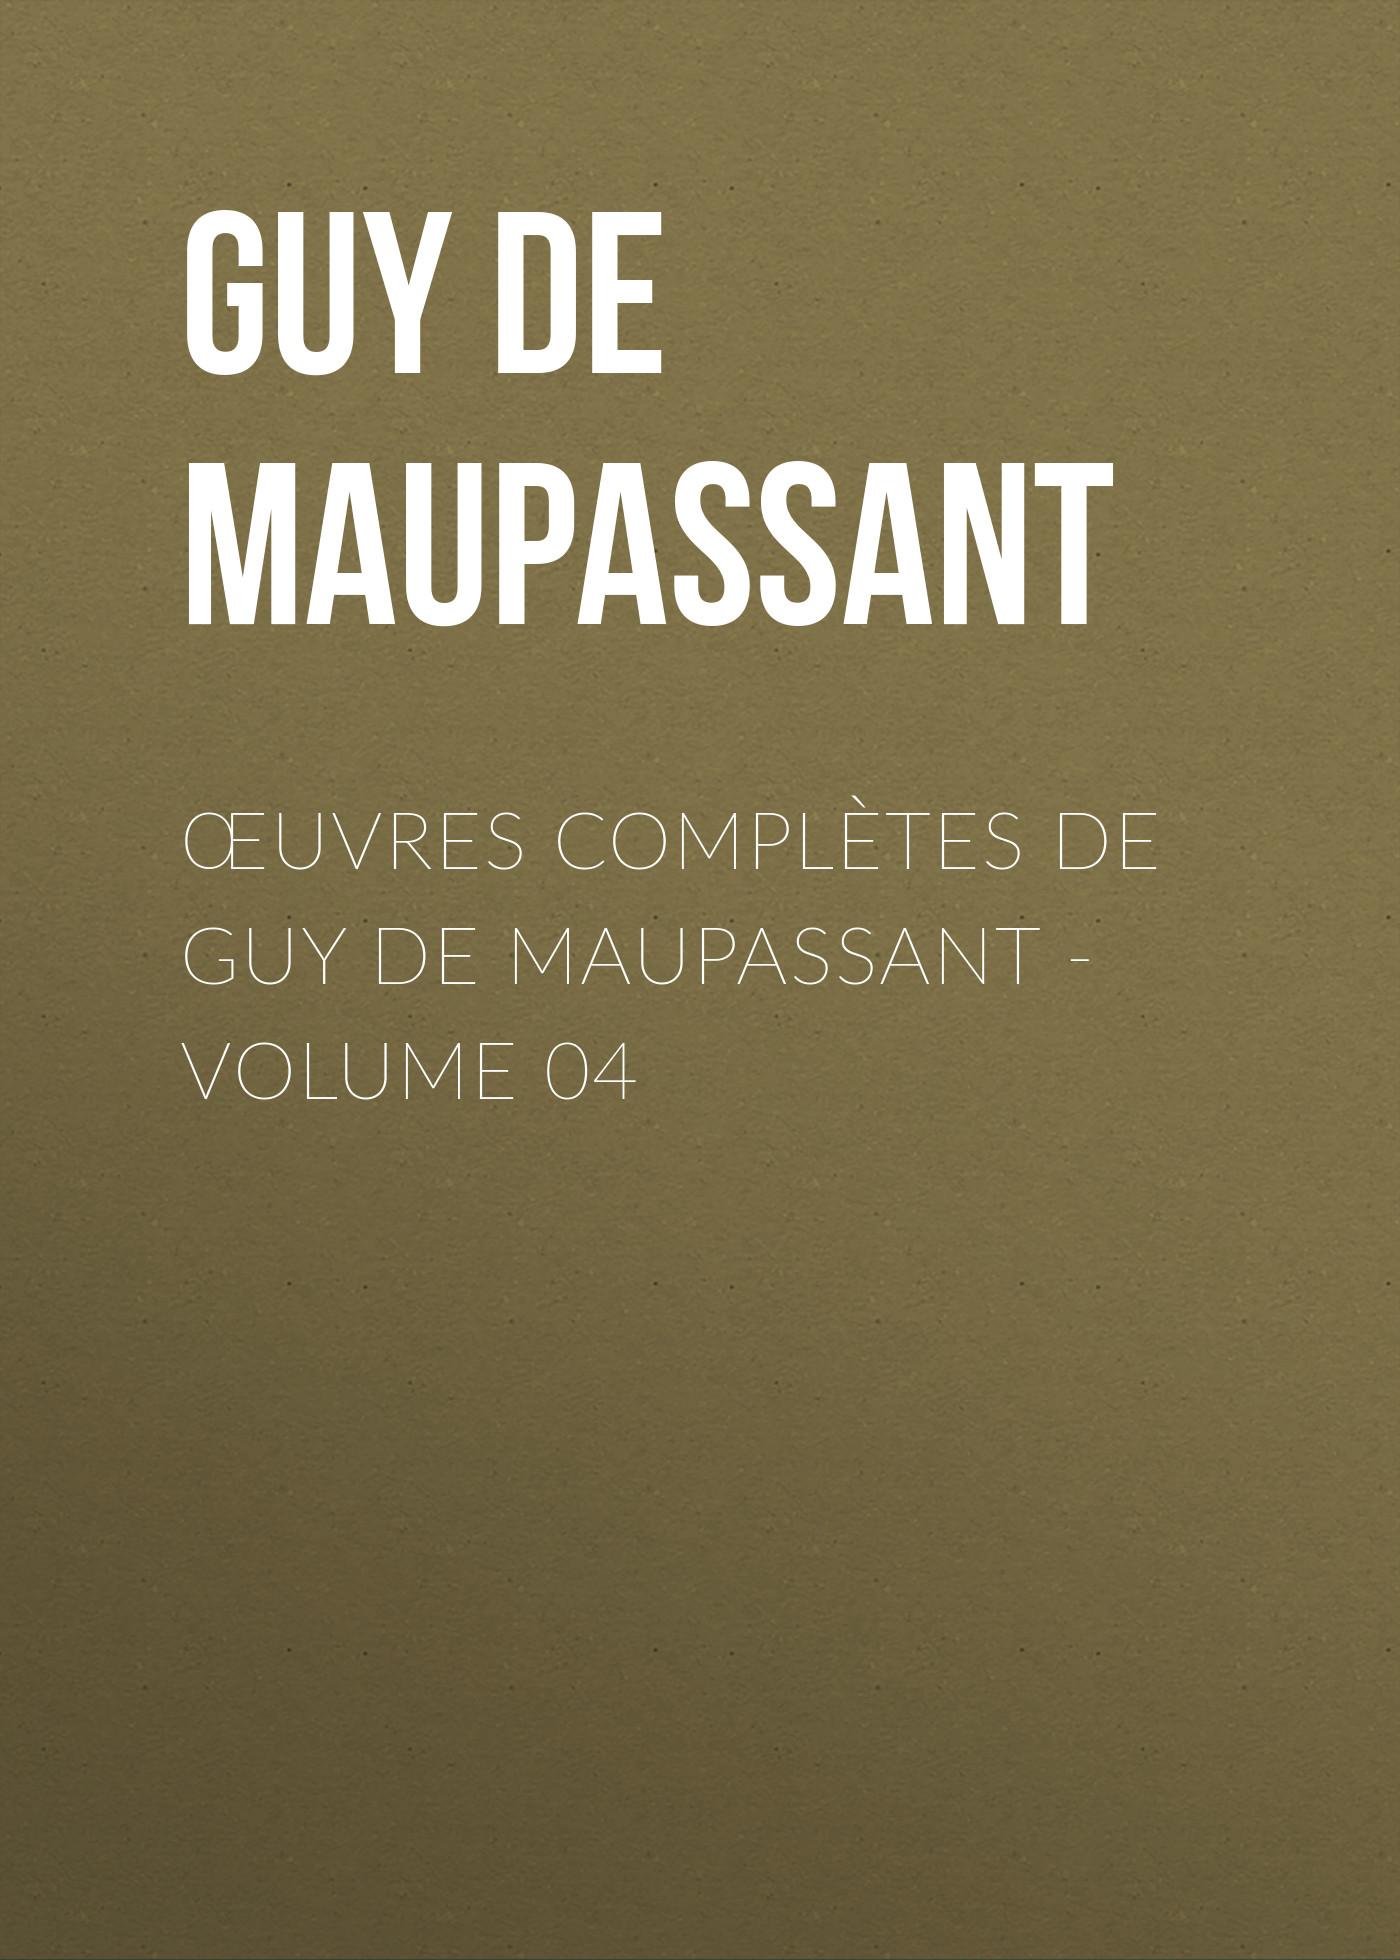 цена на Ги де Мопассан Œuvres complètes de Guy de Maupassant - volume 04